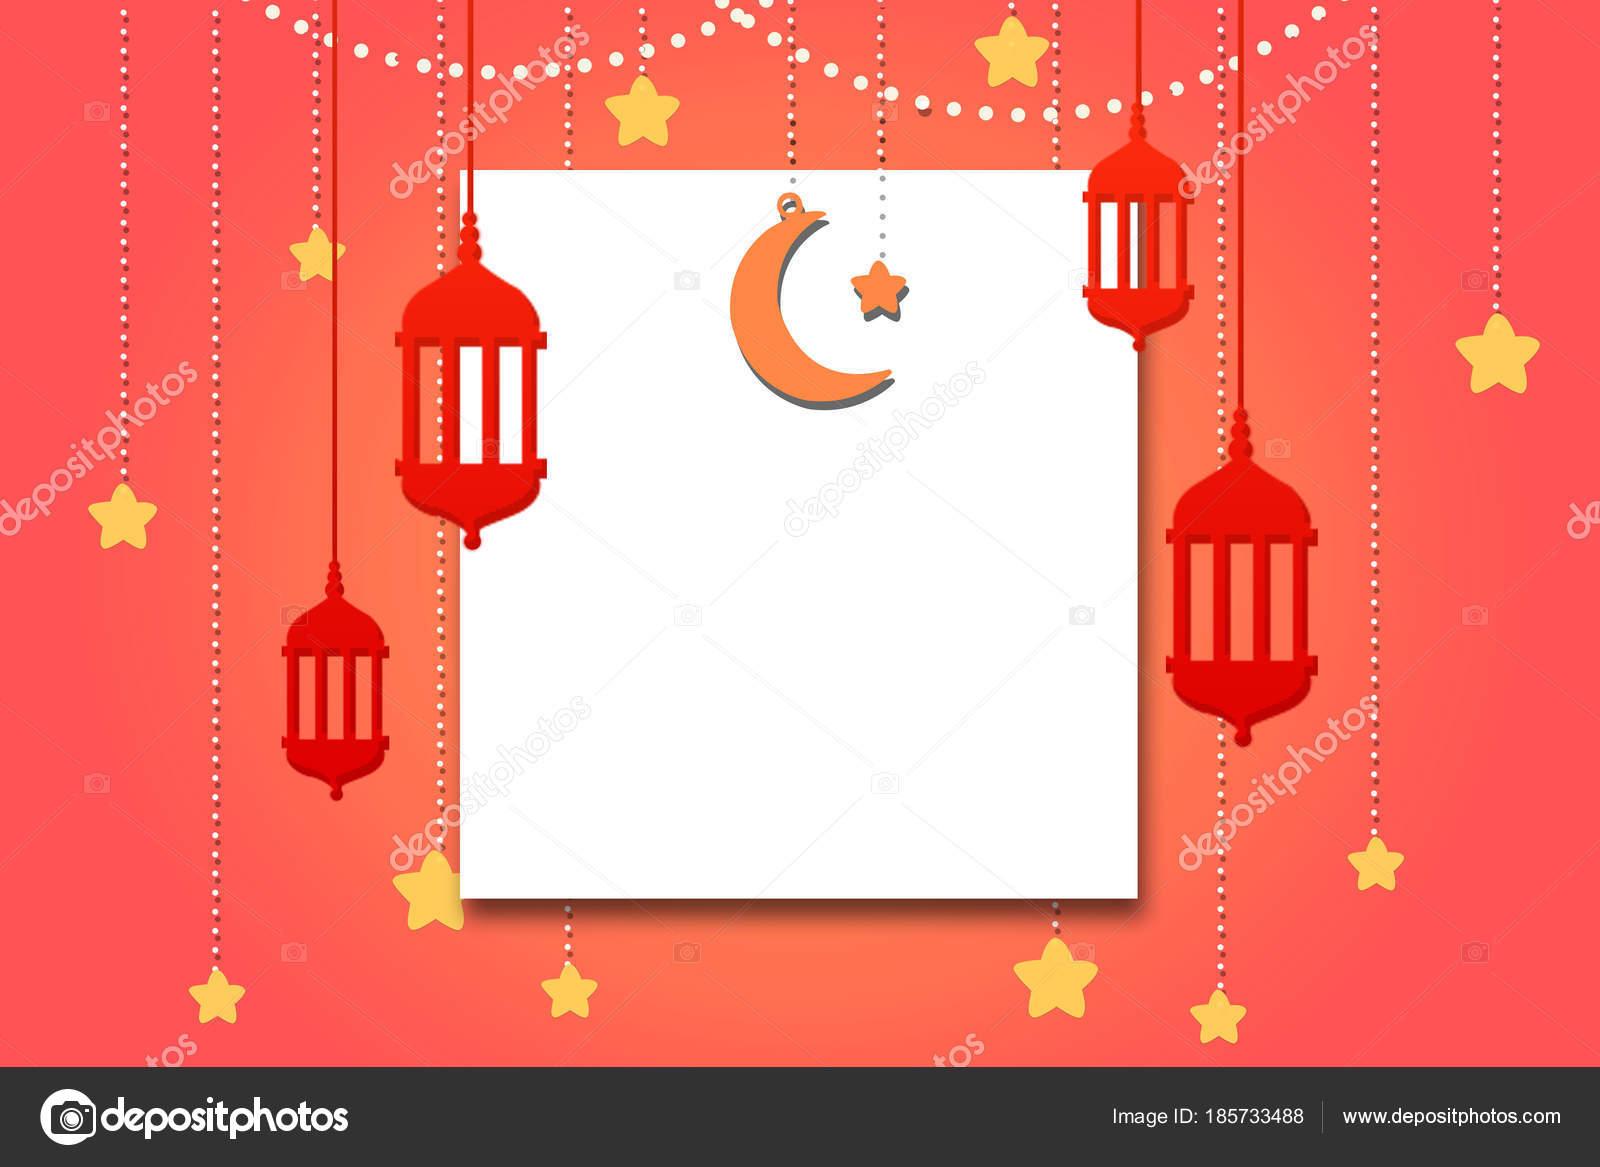 Illustration Of Eid Ul Adha Eid Mubarak Concept Banner With Moon